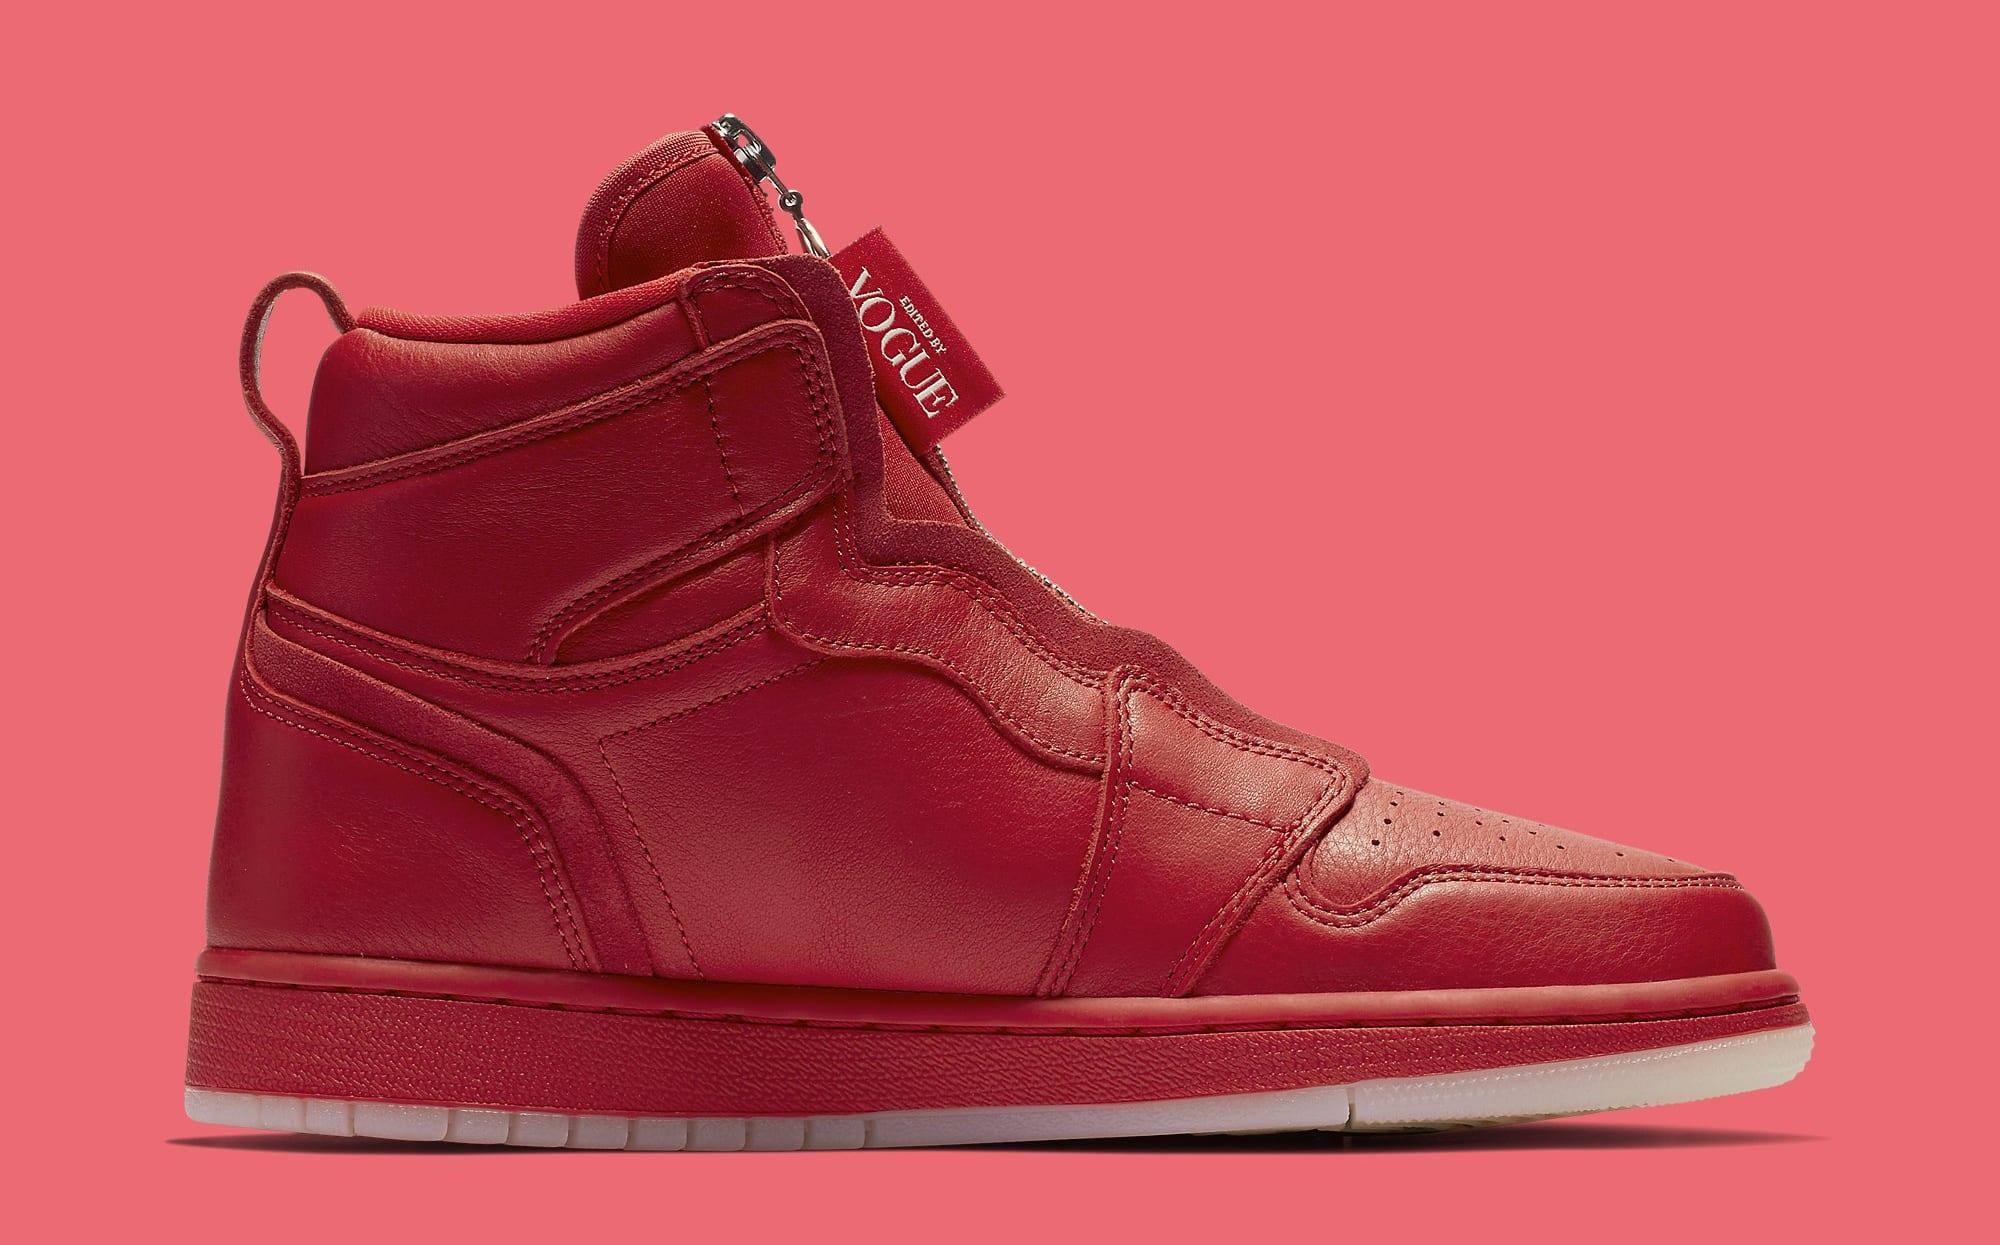 39fdbf3598e178 Image via Nike Vogue x Air Jordan 1 Zip AWOK University Red Medial